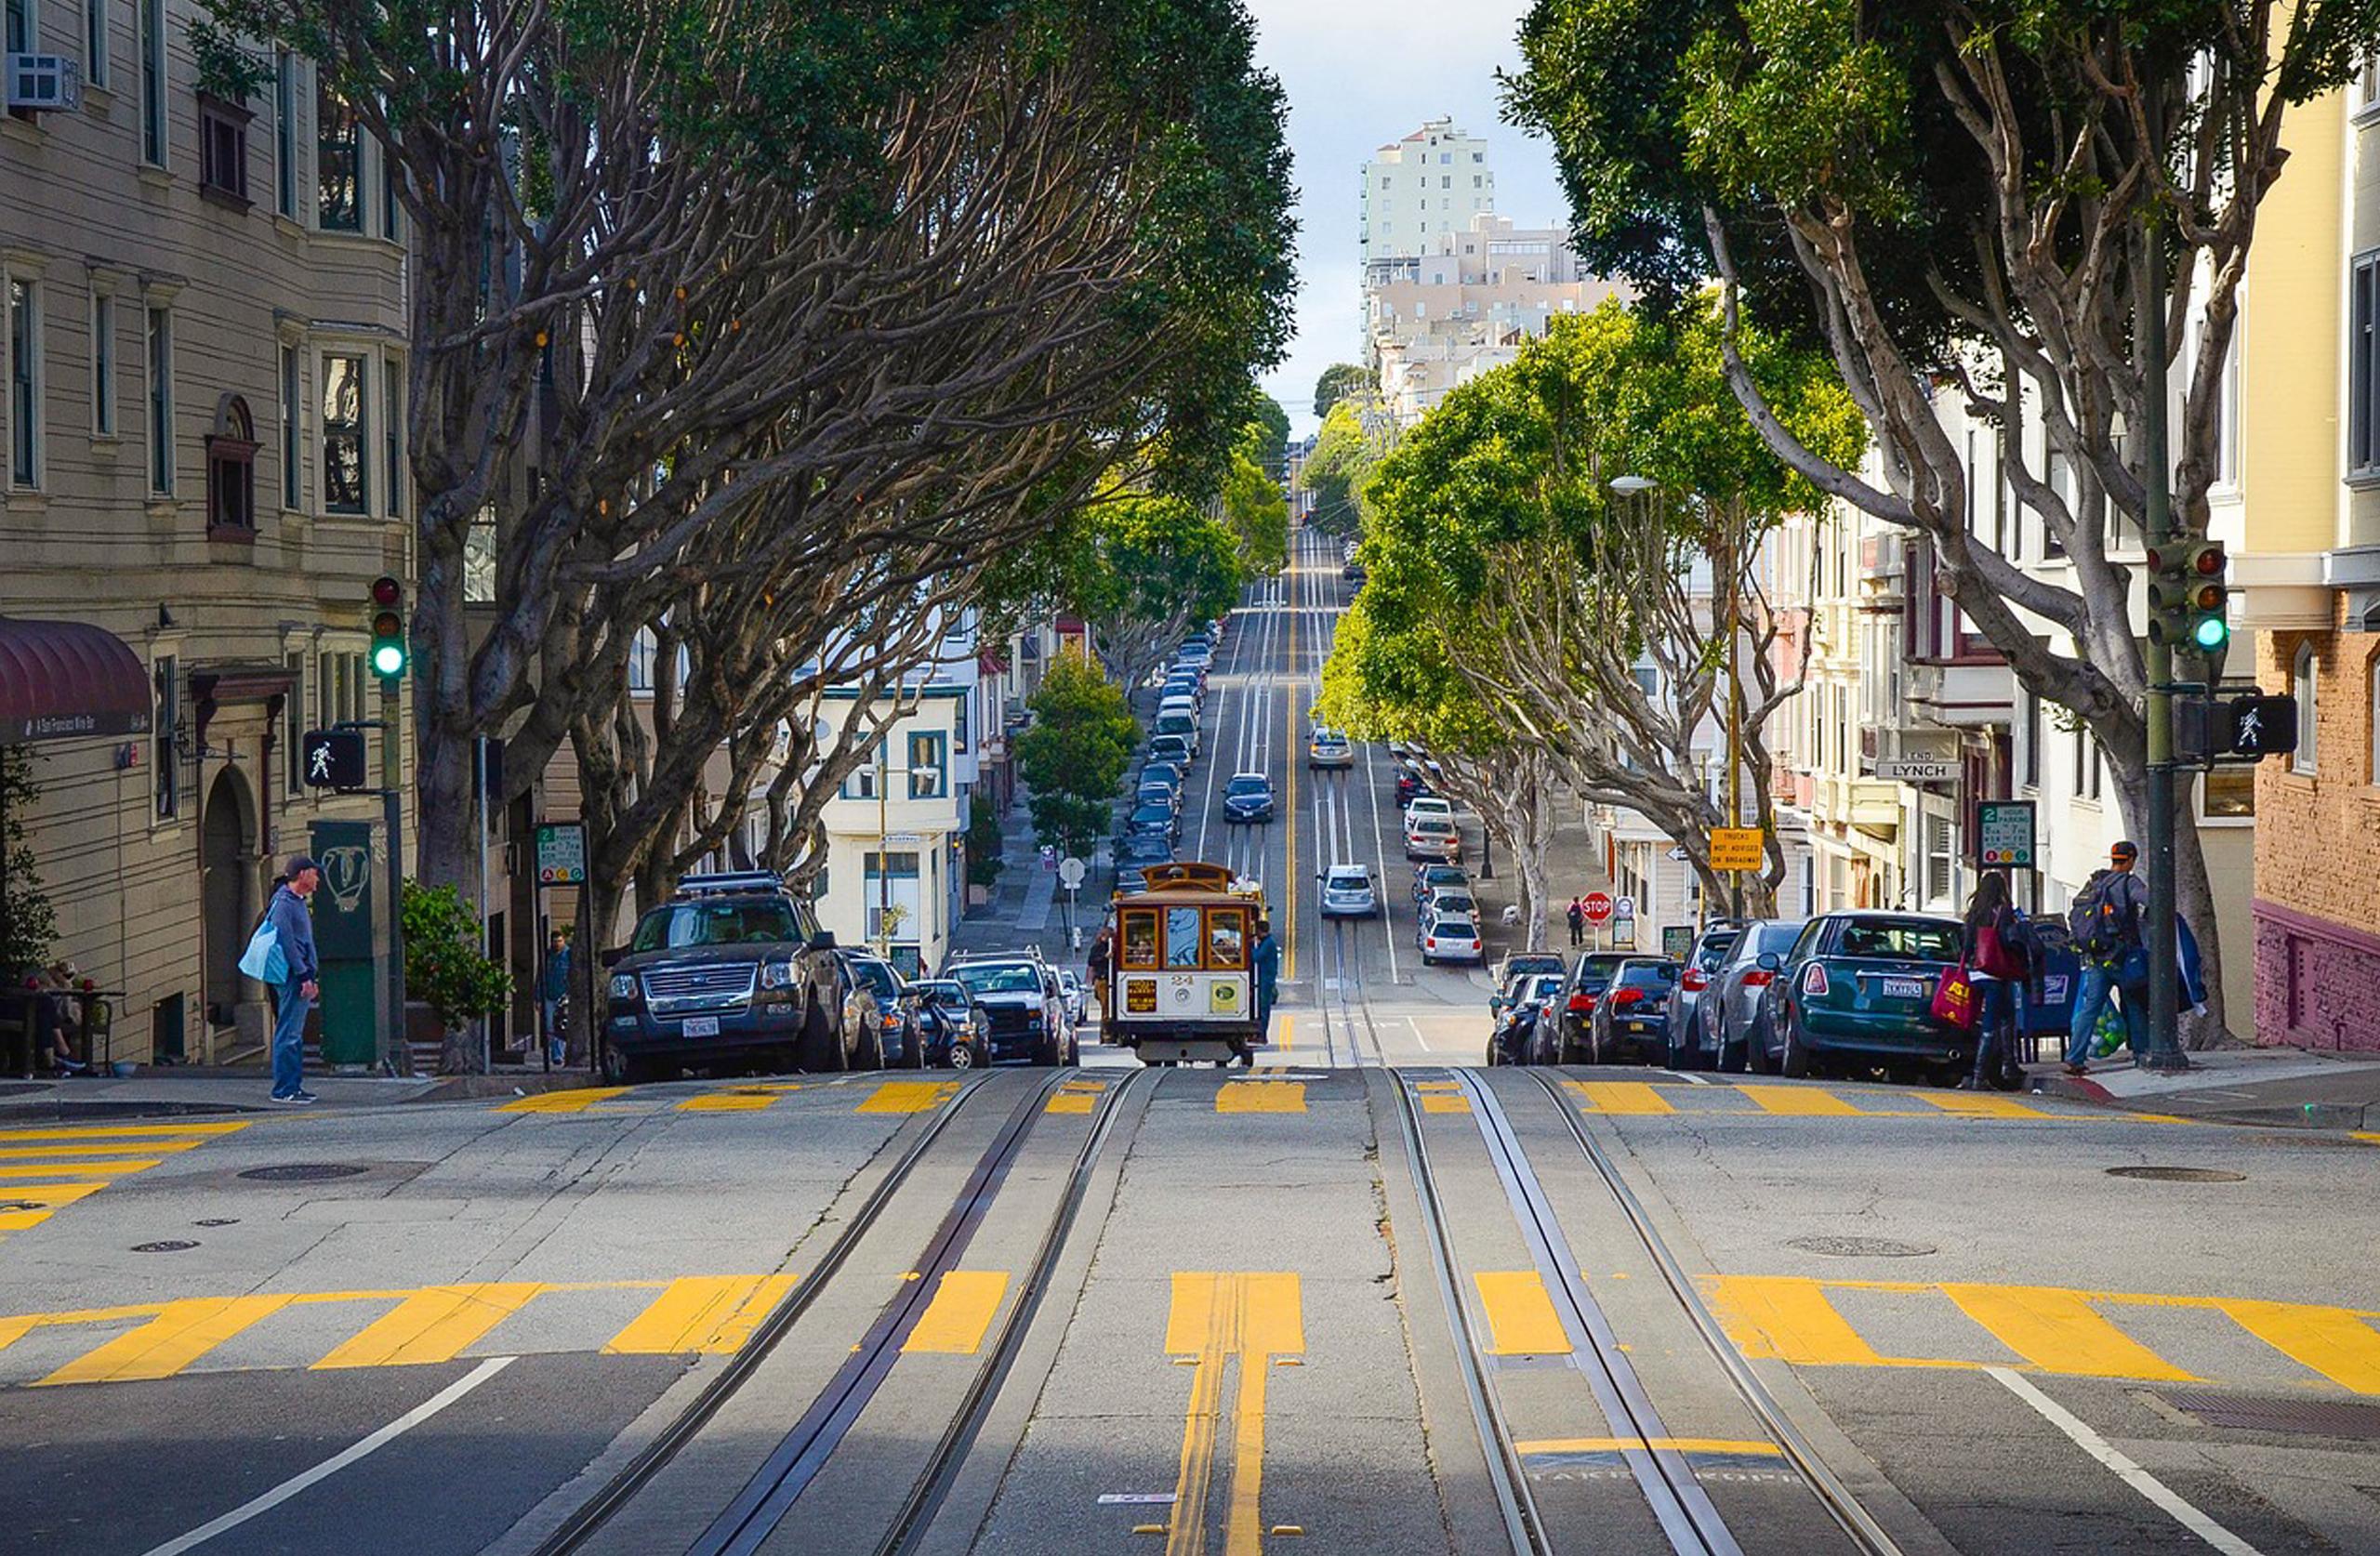 PHOTOGRAPHY WORKSHOP SAN FRANCISCO